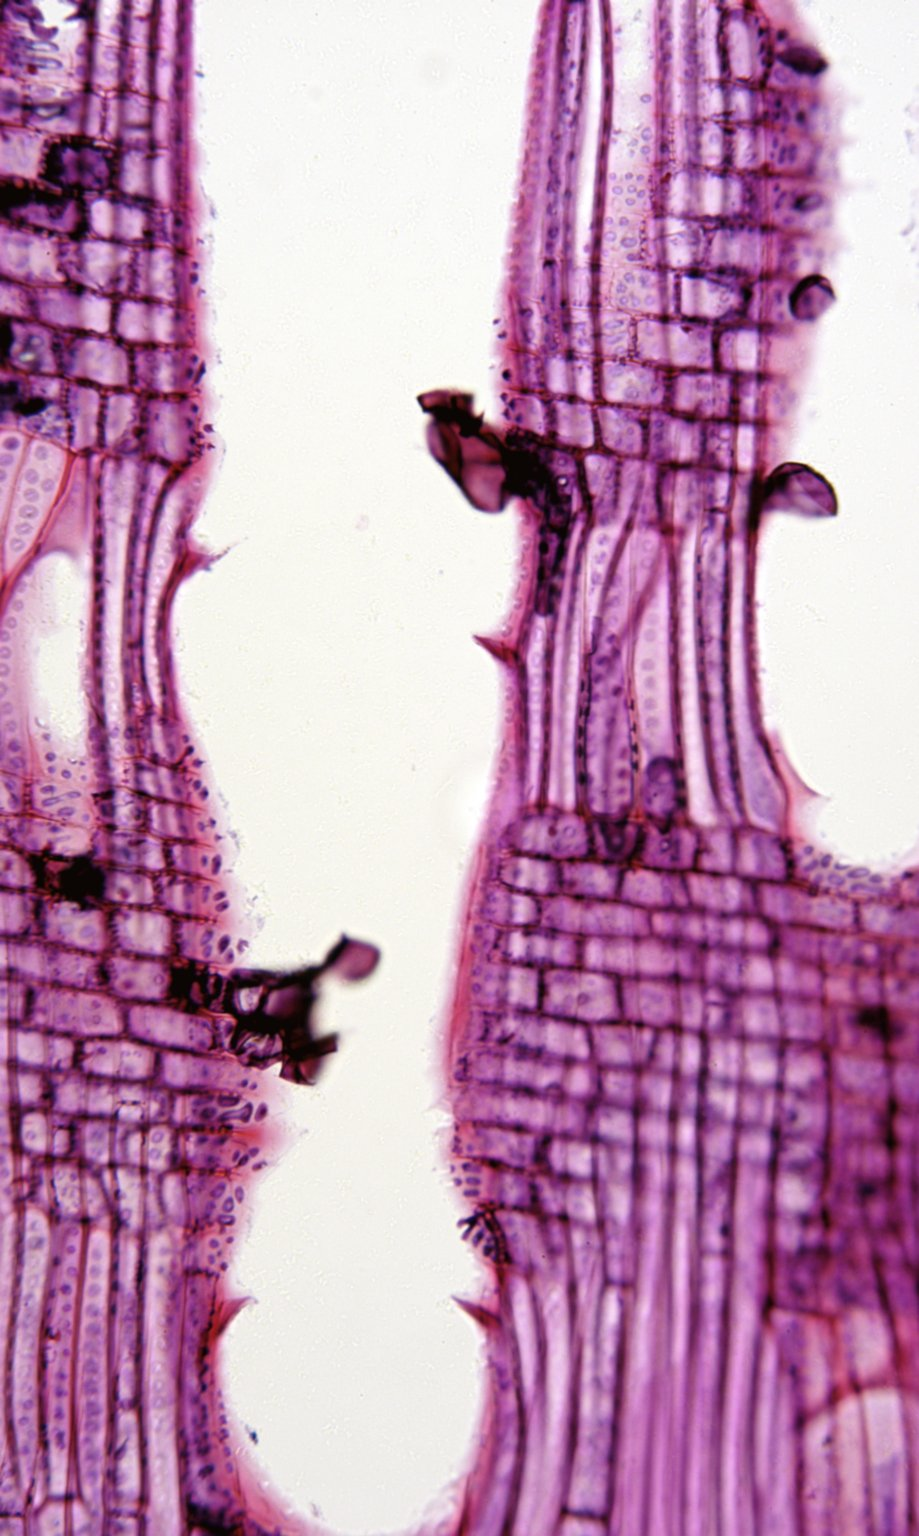 FAGACEAE Castanopsis sieboldii